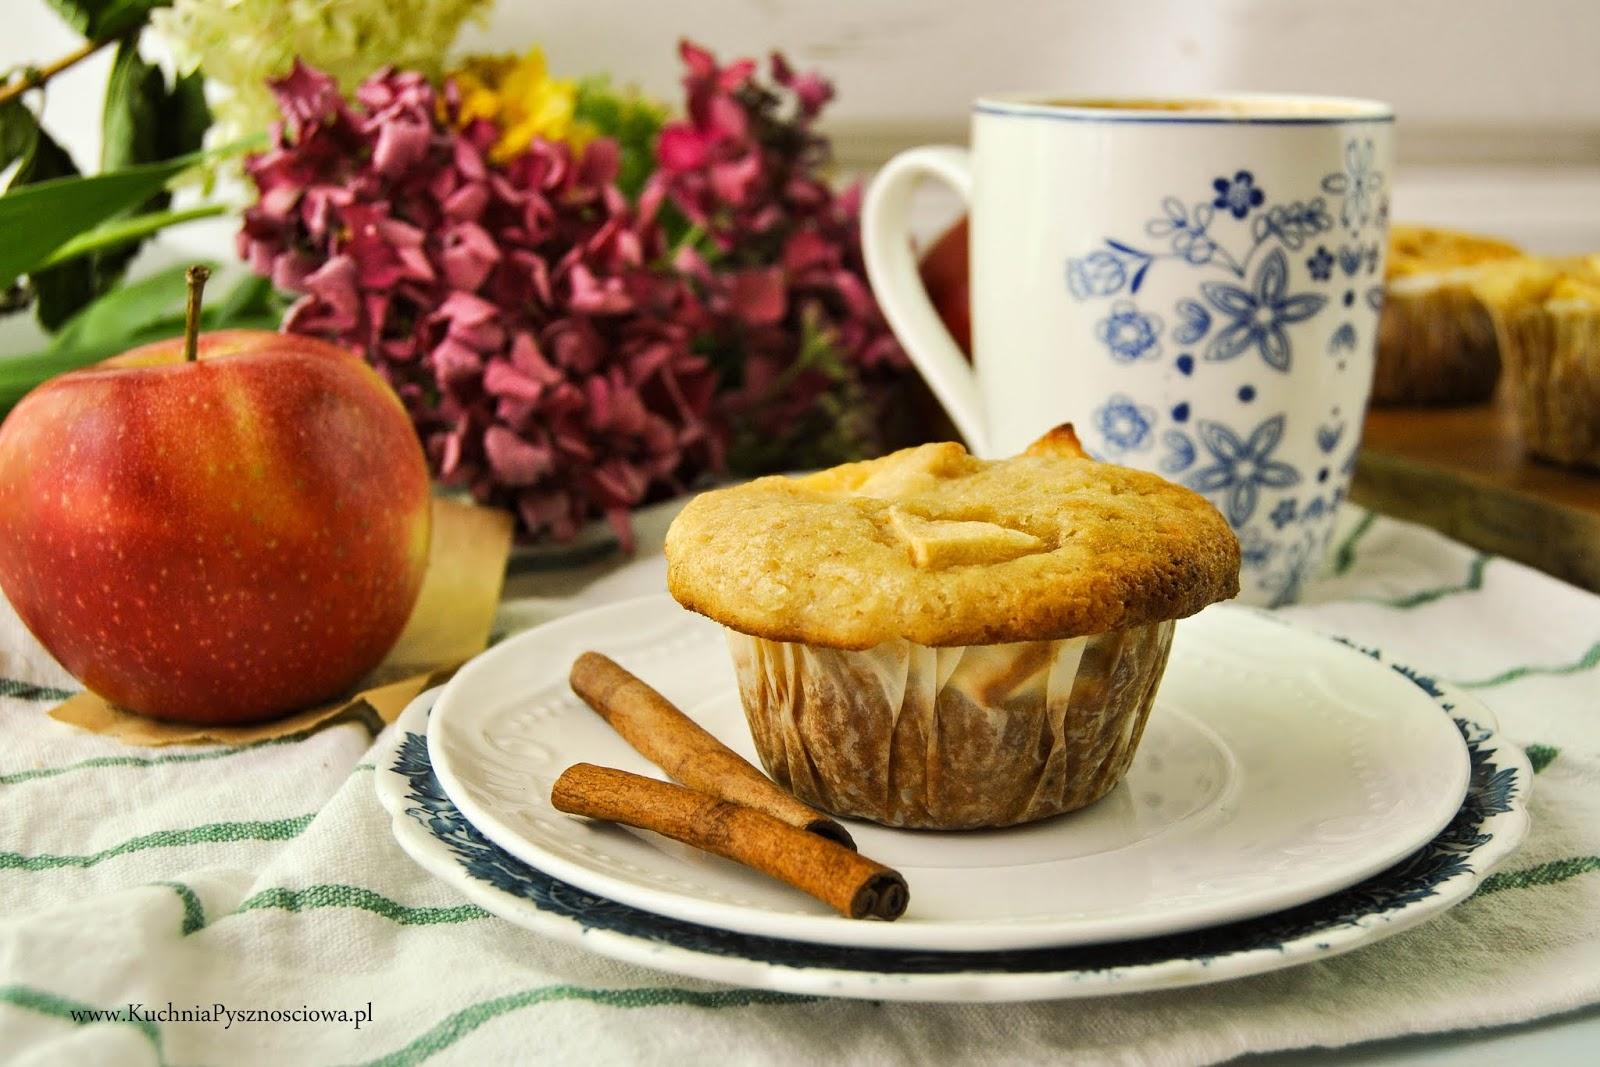 708. Muffiny z jabłkami i creme pattisiere